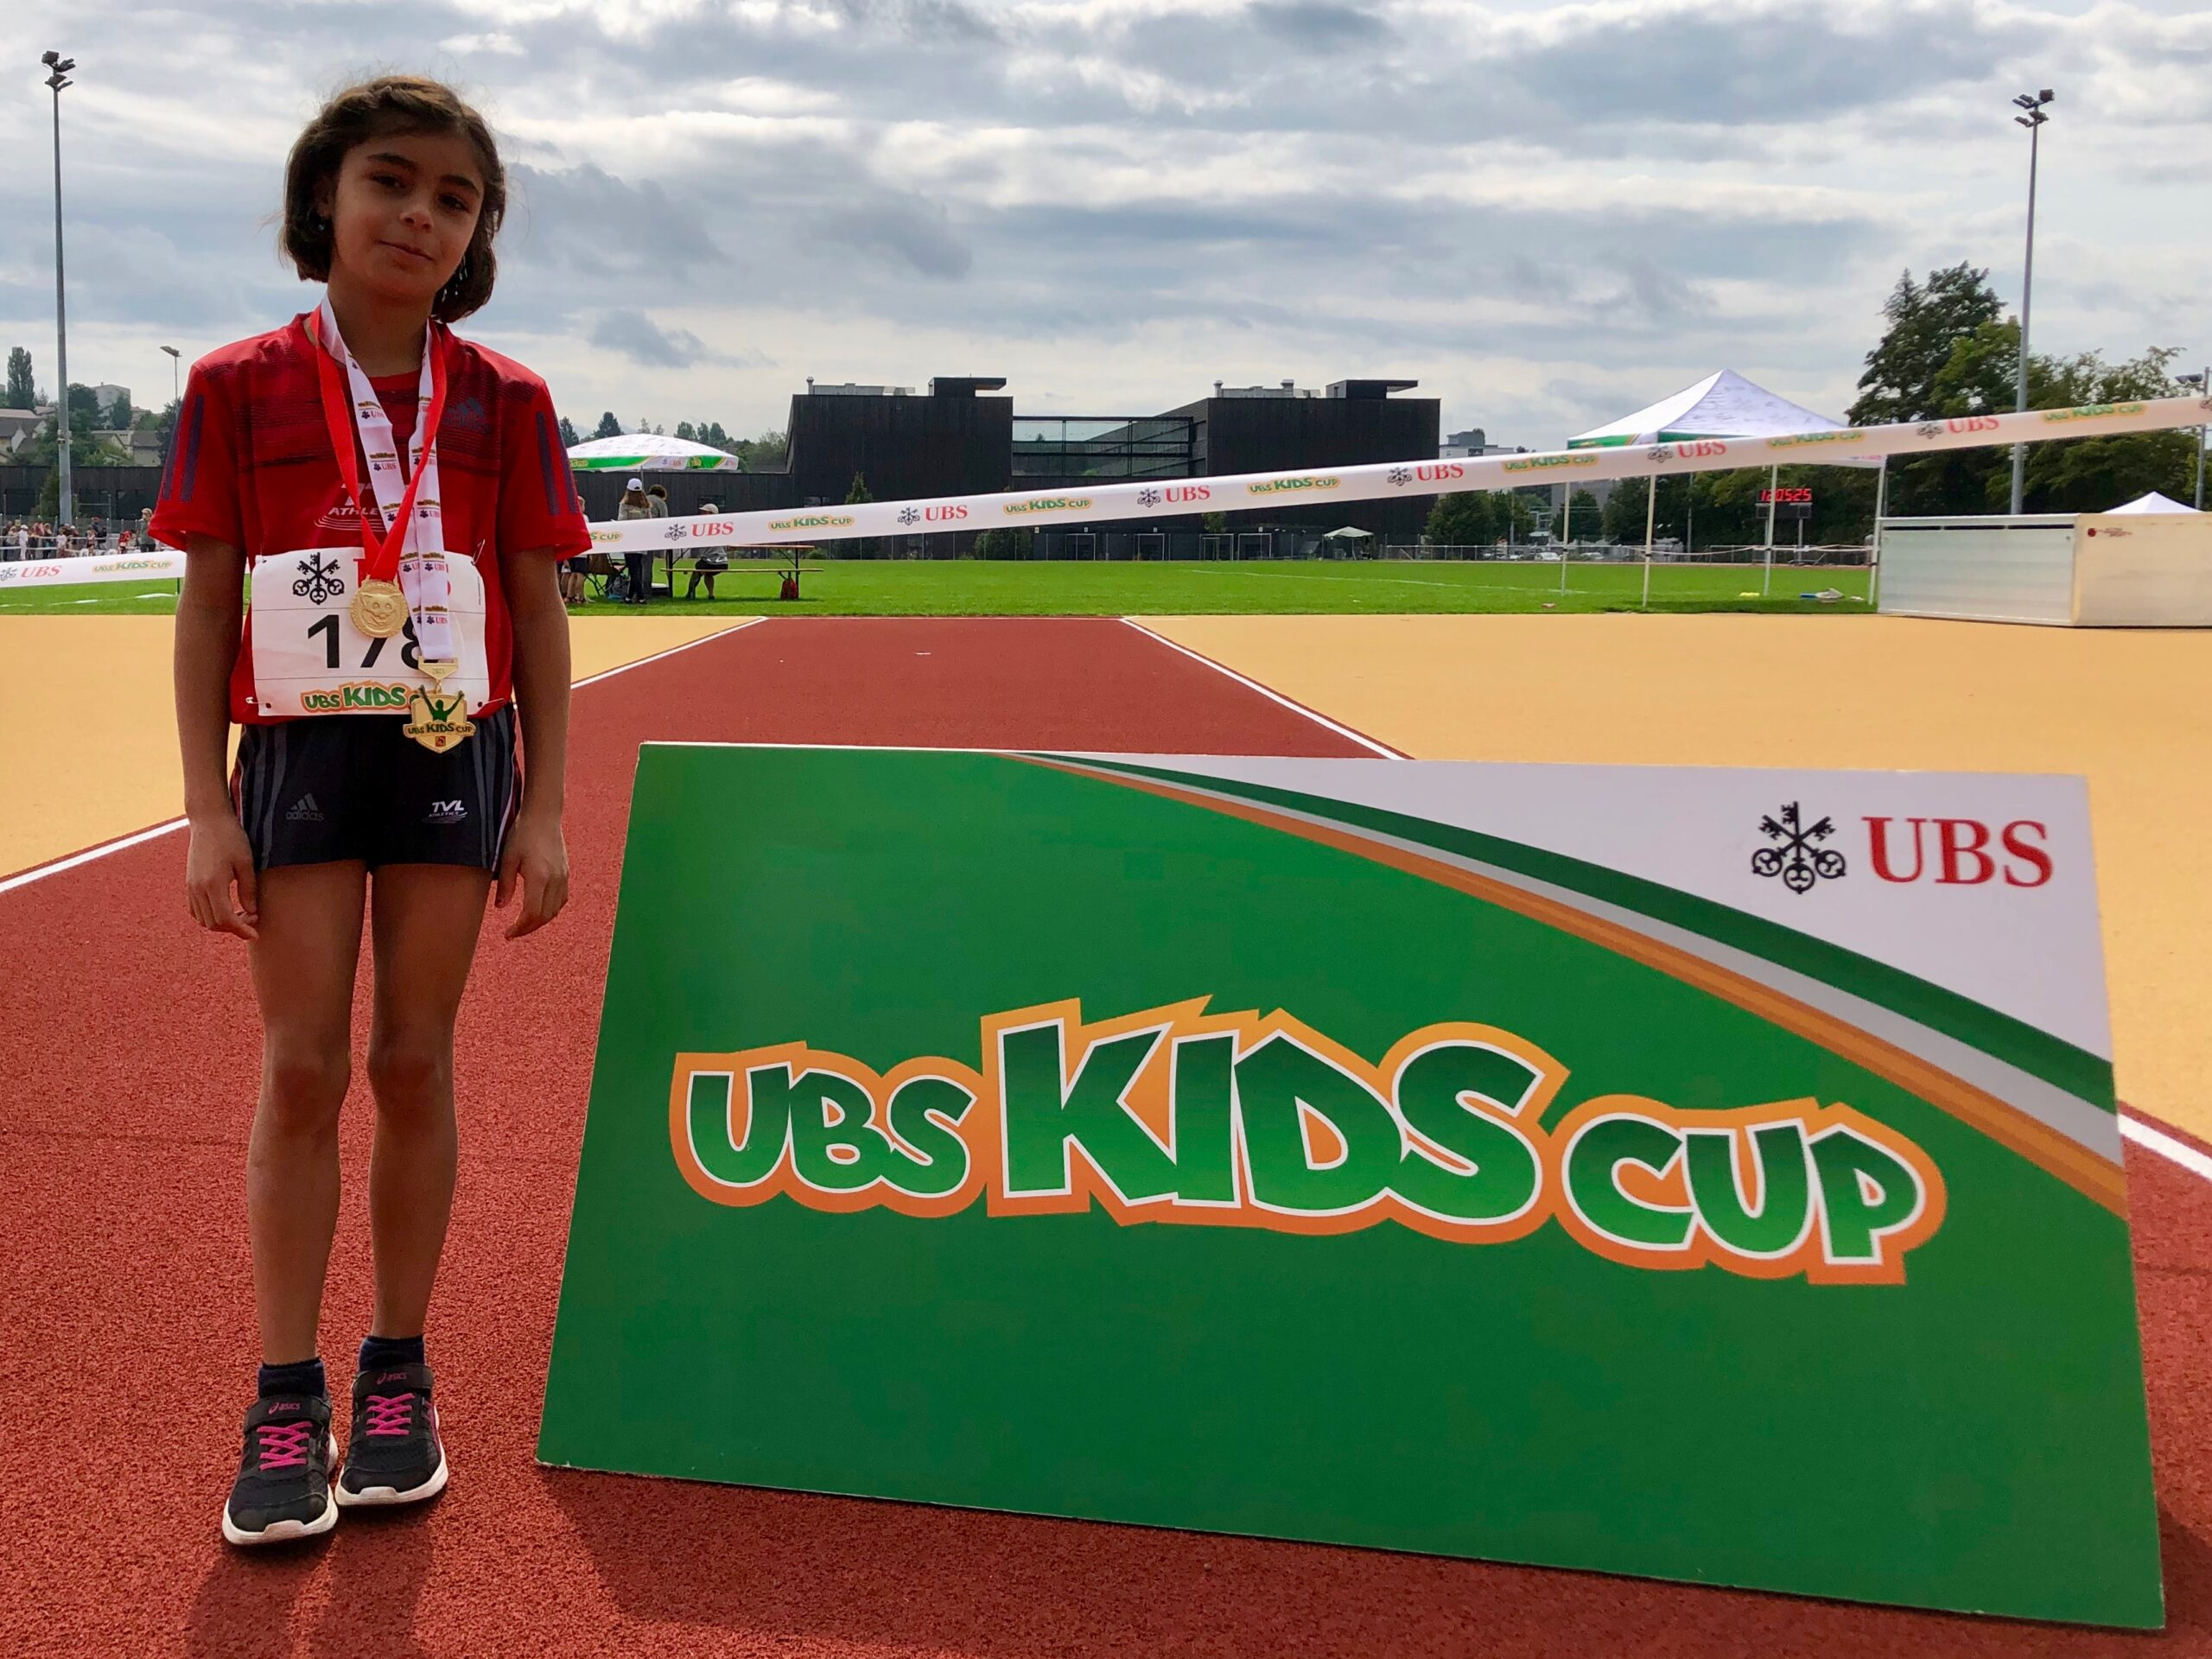 Read more about the article Bericht UBS Kids Cup Kantonalfinal in Biel